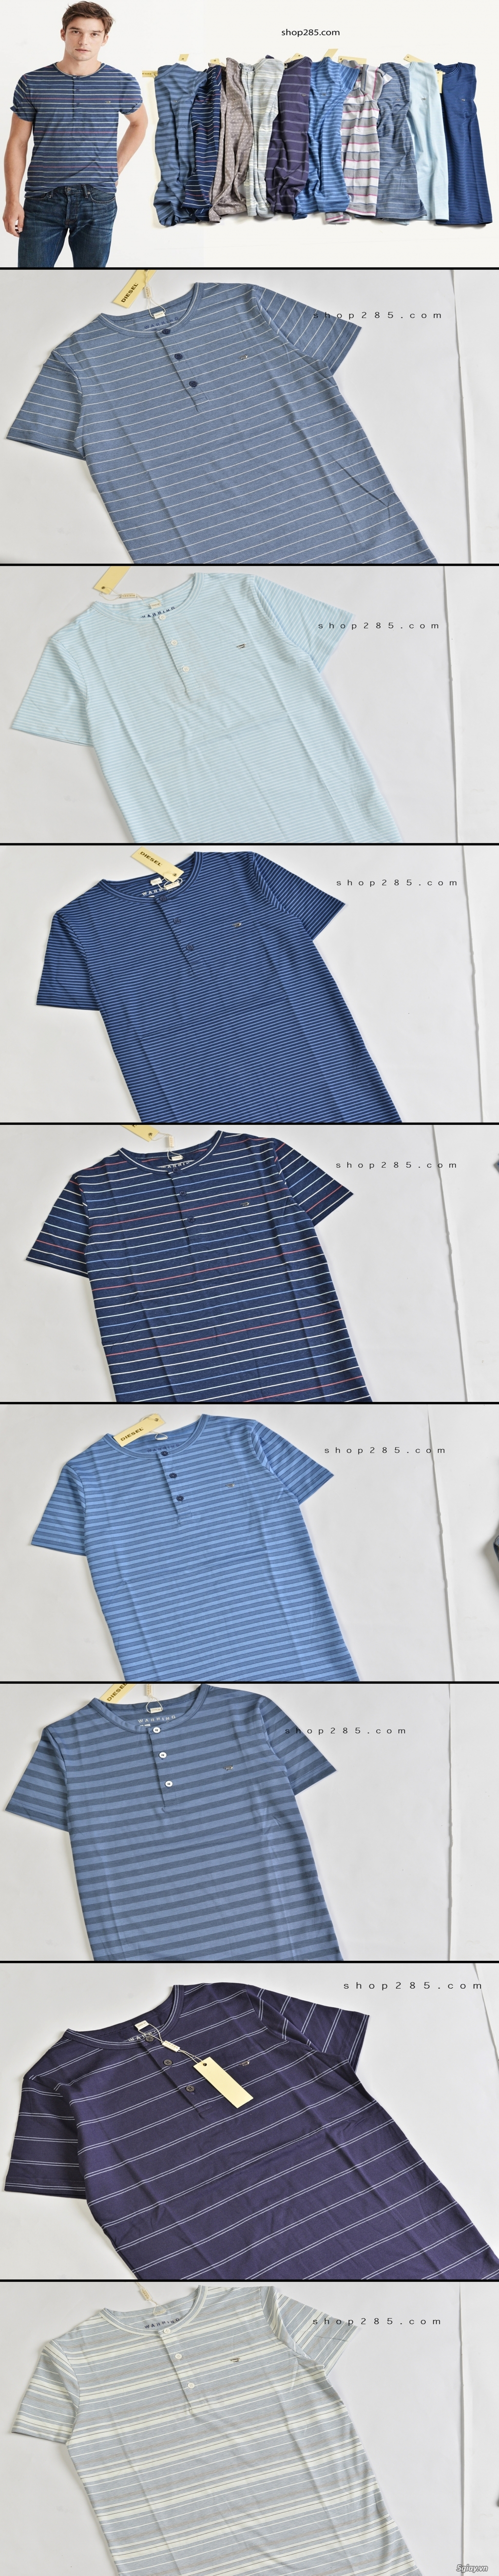 Áo thun Hollister VNXK,áo thun SuperDry VNXK ,áo A&F VNXK ,áo thun cổ tim thun láng - 16